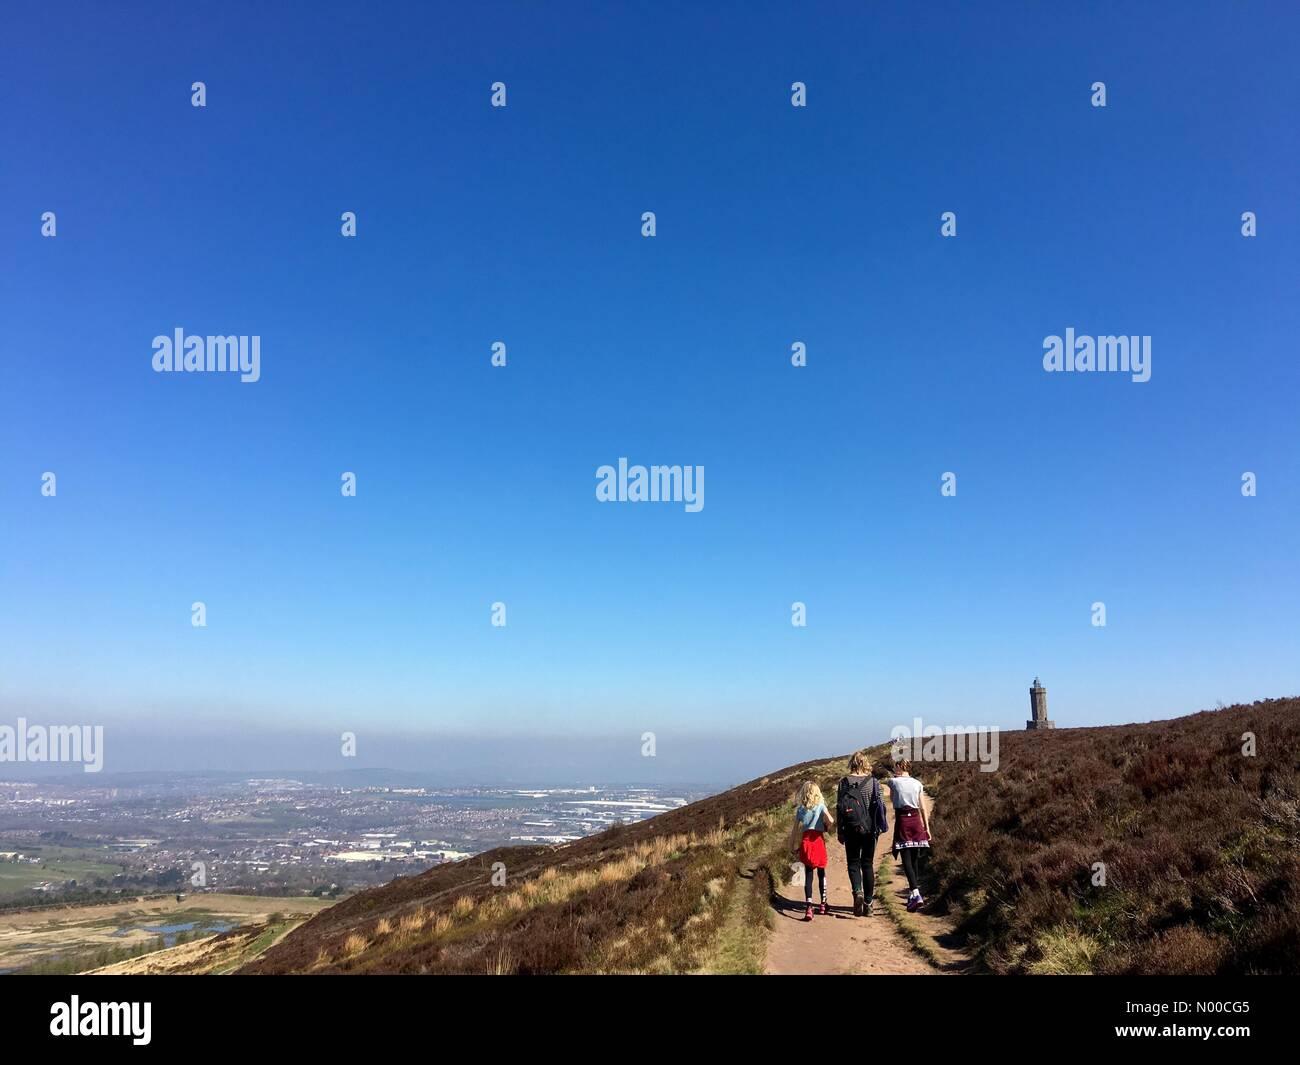 Uk Weather Day In Blackburn Lancashire Blue Sky Above Darwen Tower On The Moors Above Blackburn